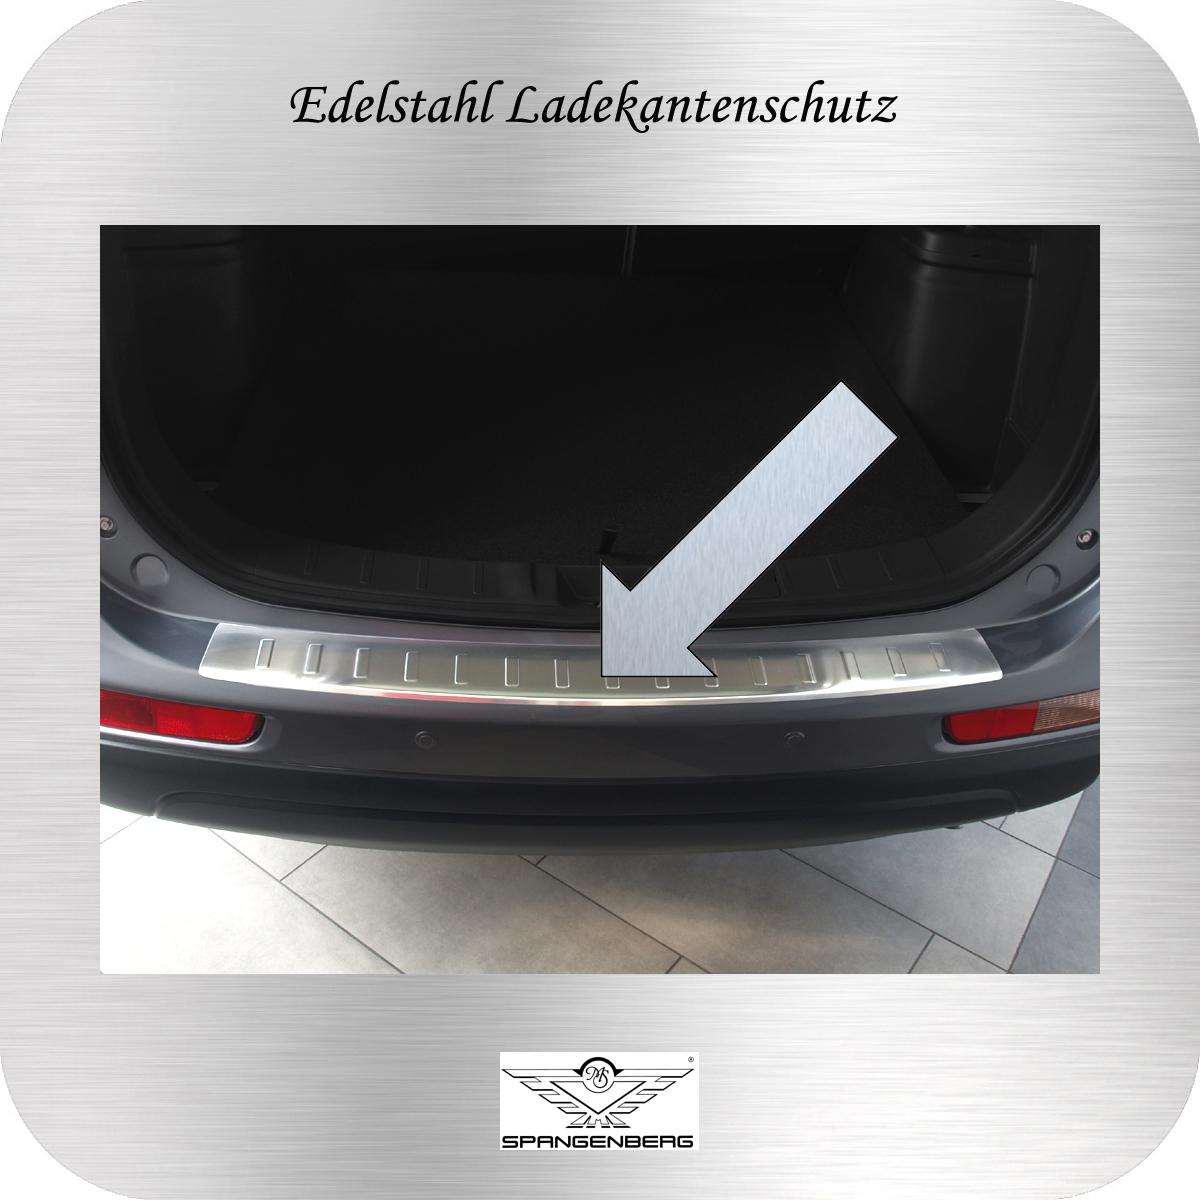 Ladekantenschutz Edelstahl Mitsubishi Outlander III vor FL 2012-2015 3235760